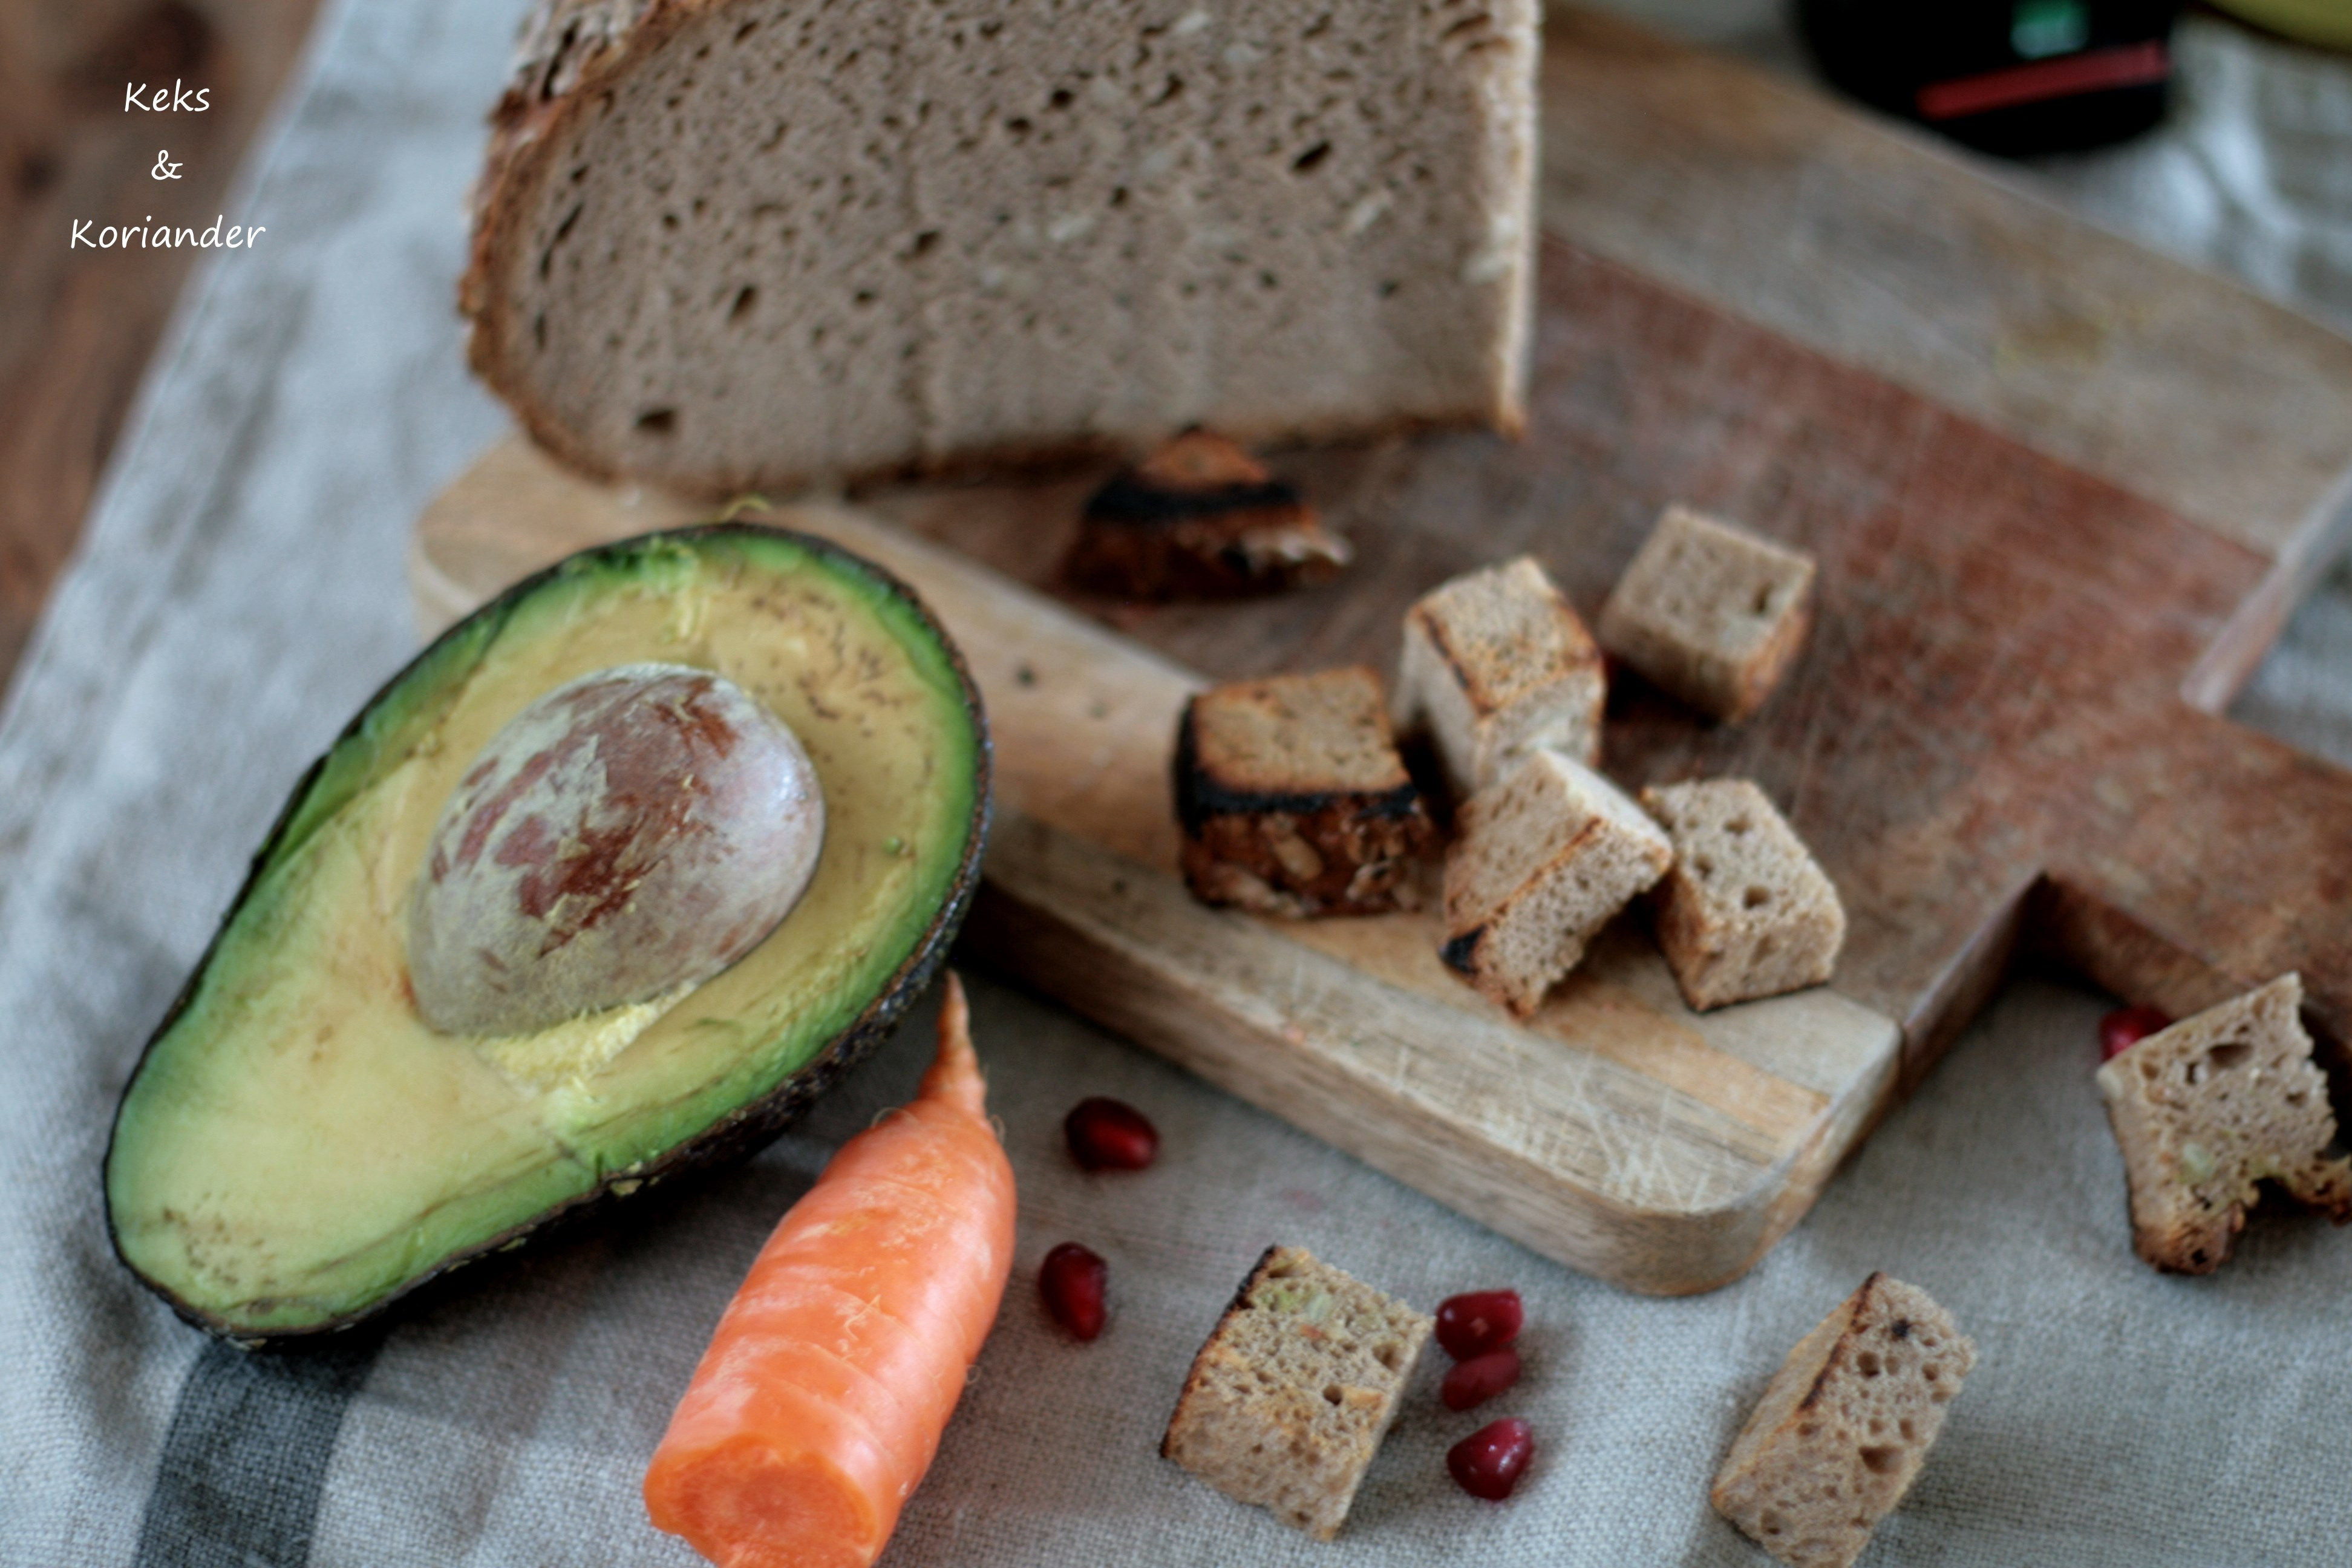 Brotsalat zum Mitnehmen mit Granatapfel, Avocado, Karotte, Feldsalat, Walnüssen 4